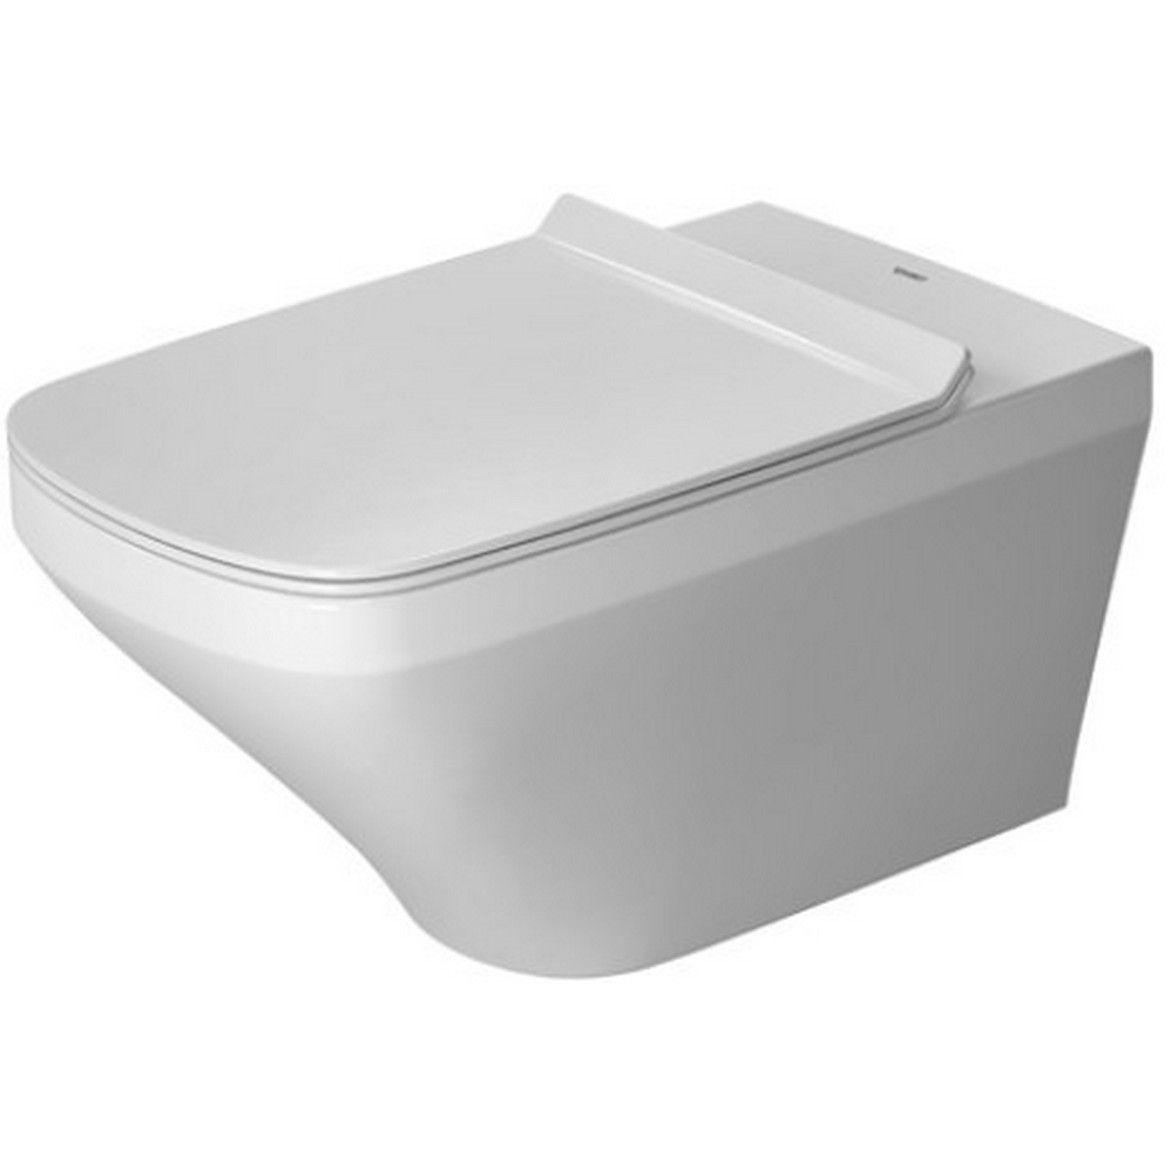 Duravit Durastyle Dual Flush Toilet Bowl Only